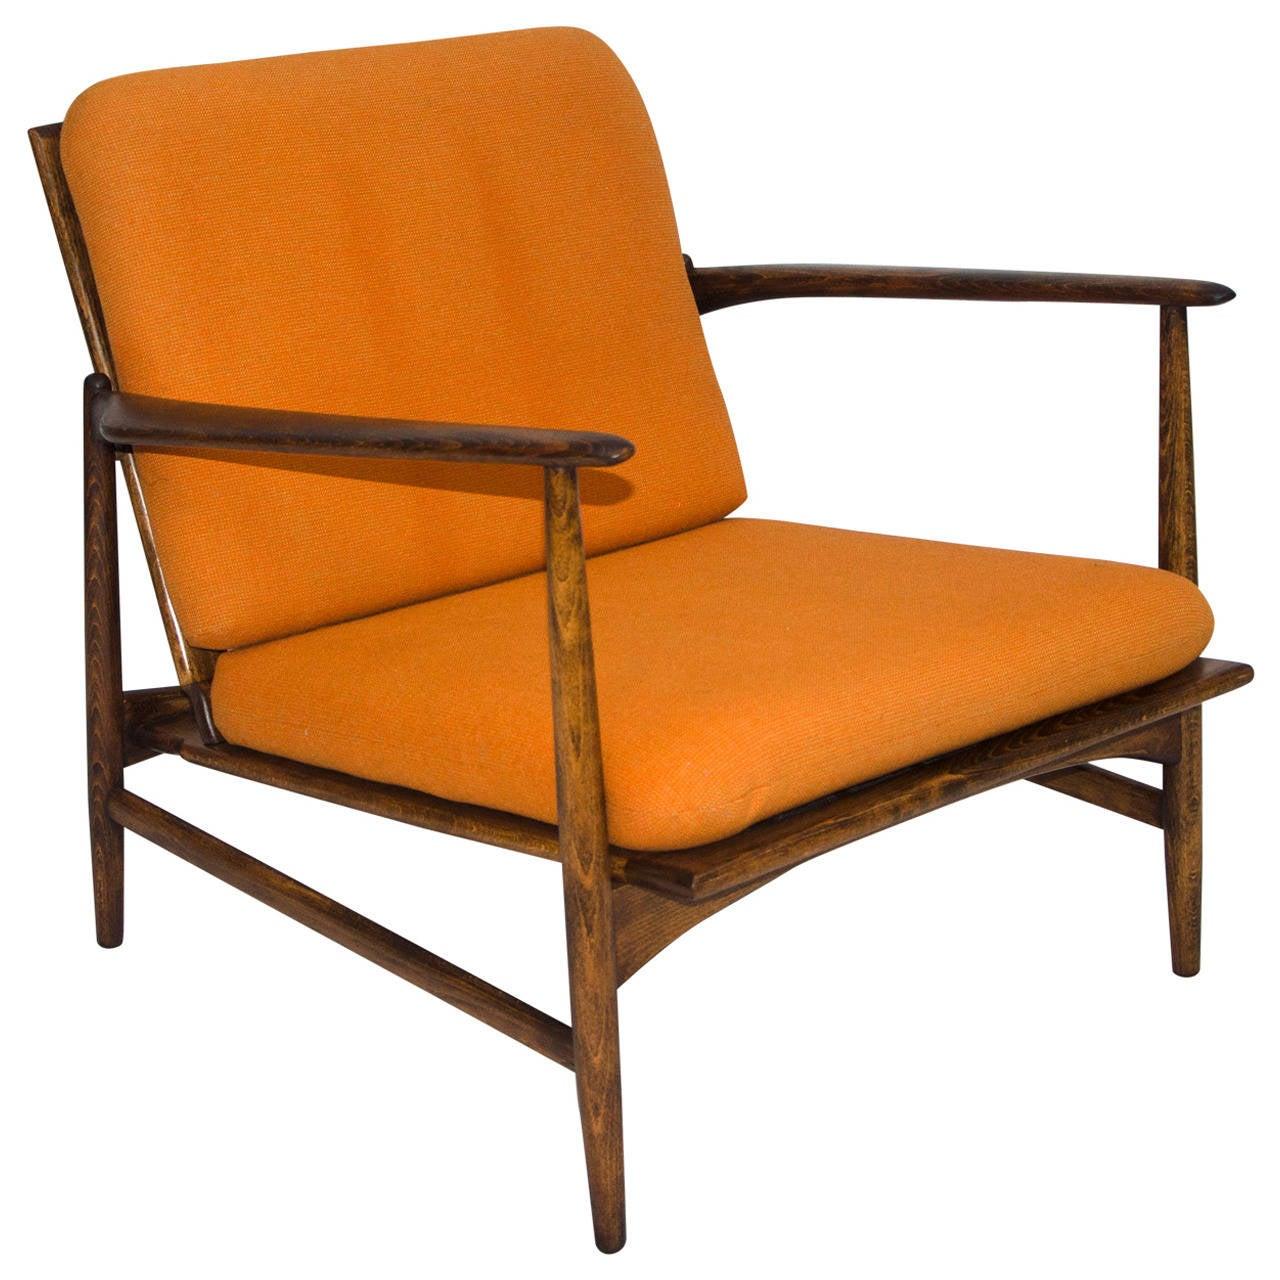 Danish Lounge Chair  Selig  Ib KofodLarsen at 1stdibs